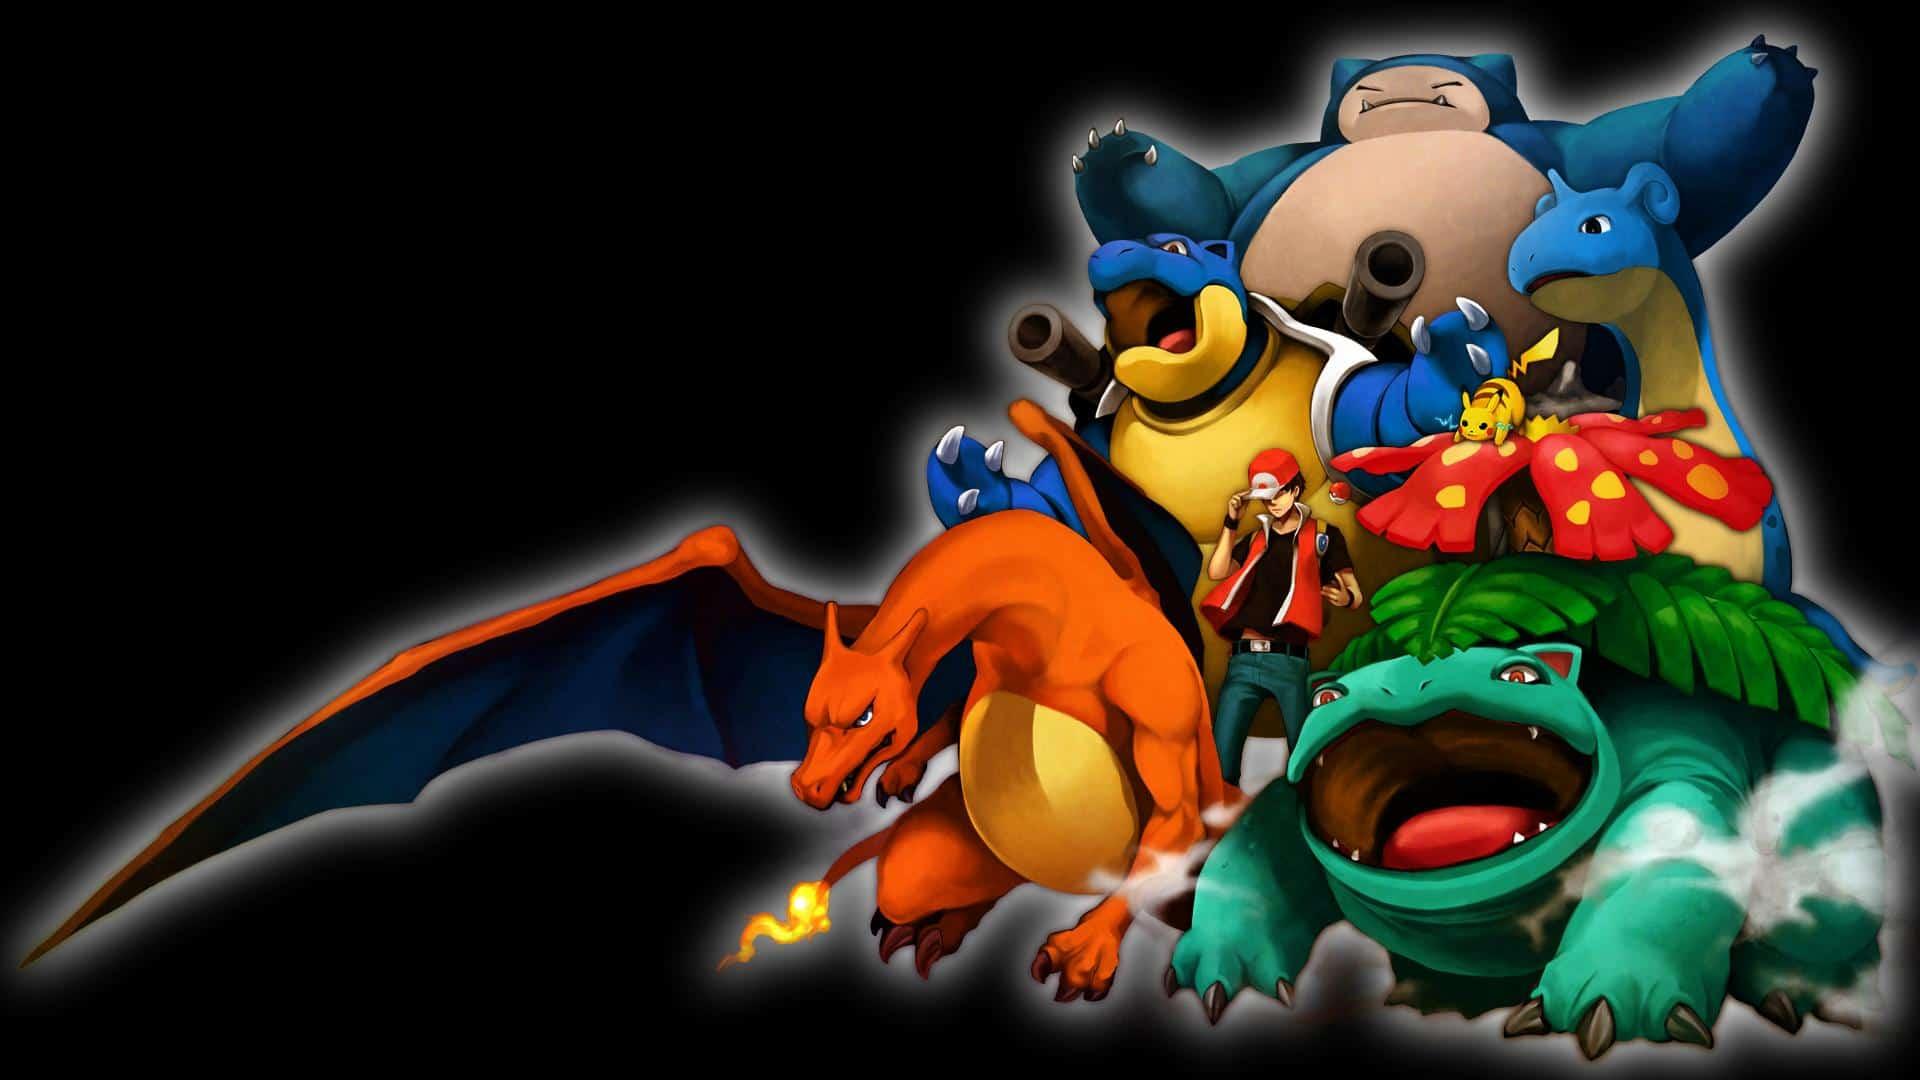 Pokémon Stars in arrivo su Nintendo Switch a fine 2017 [RUMOUR]